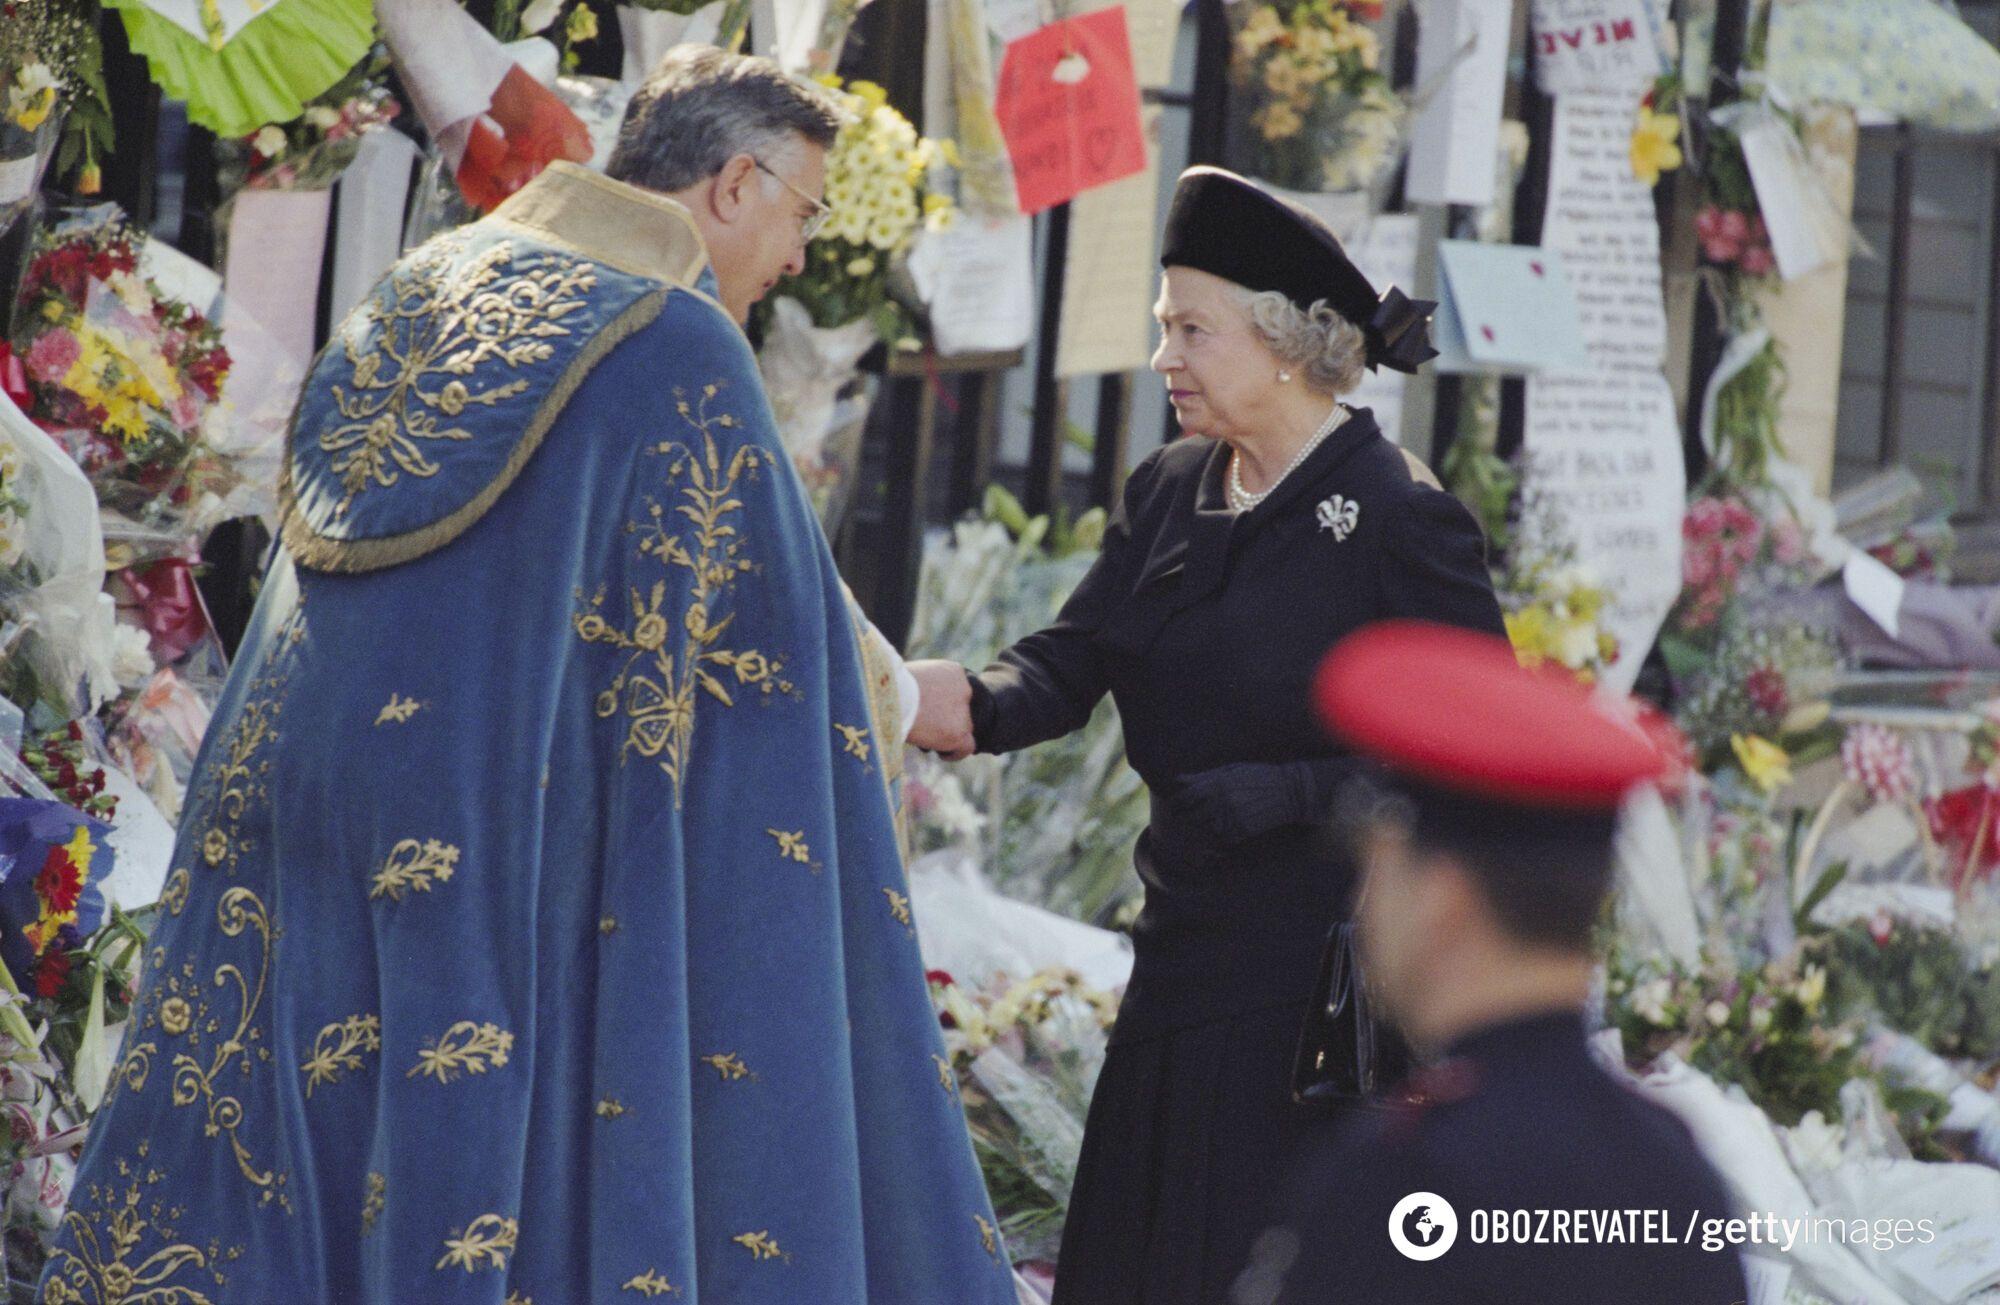 Королева Єлизавета II на похоронах принцеси Діани